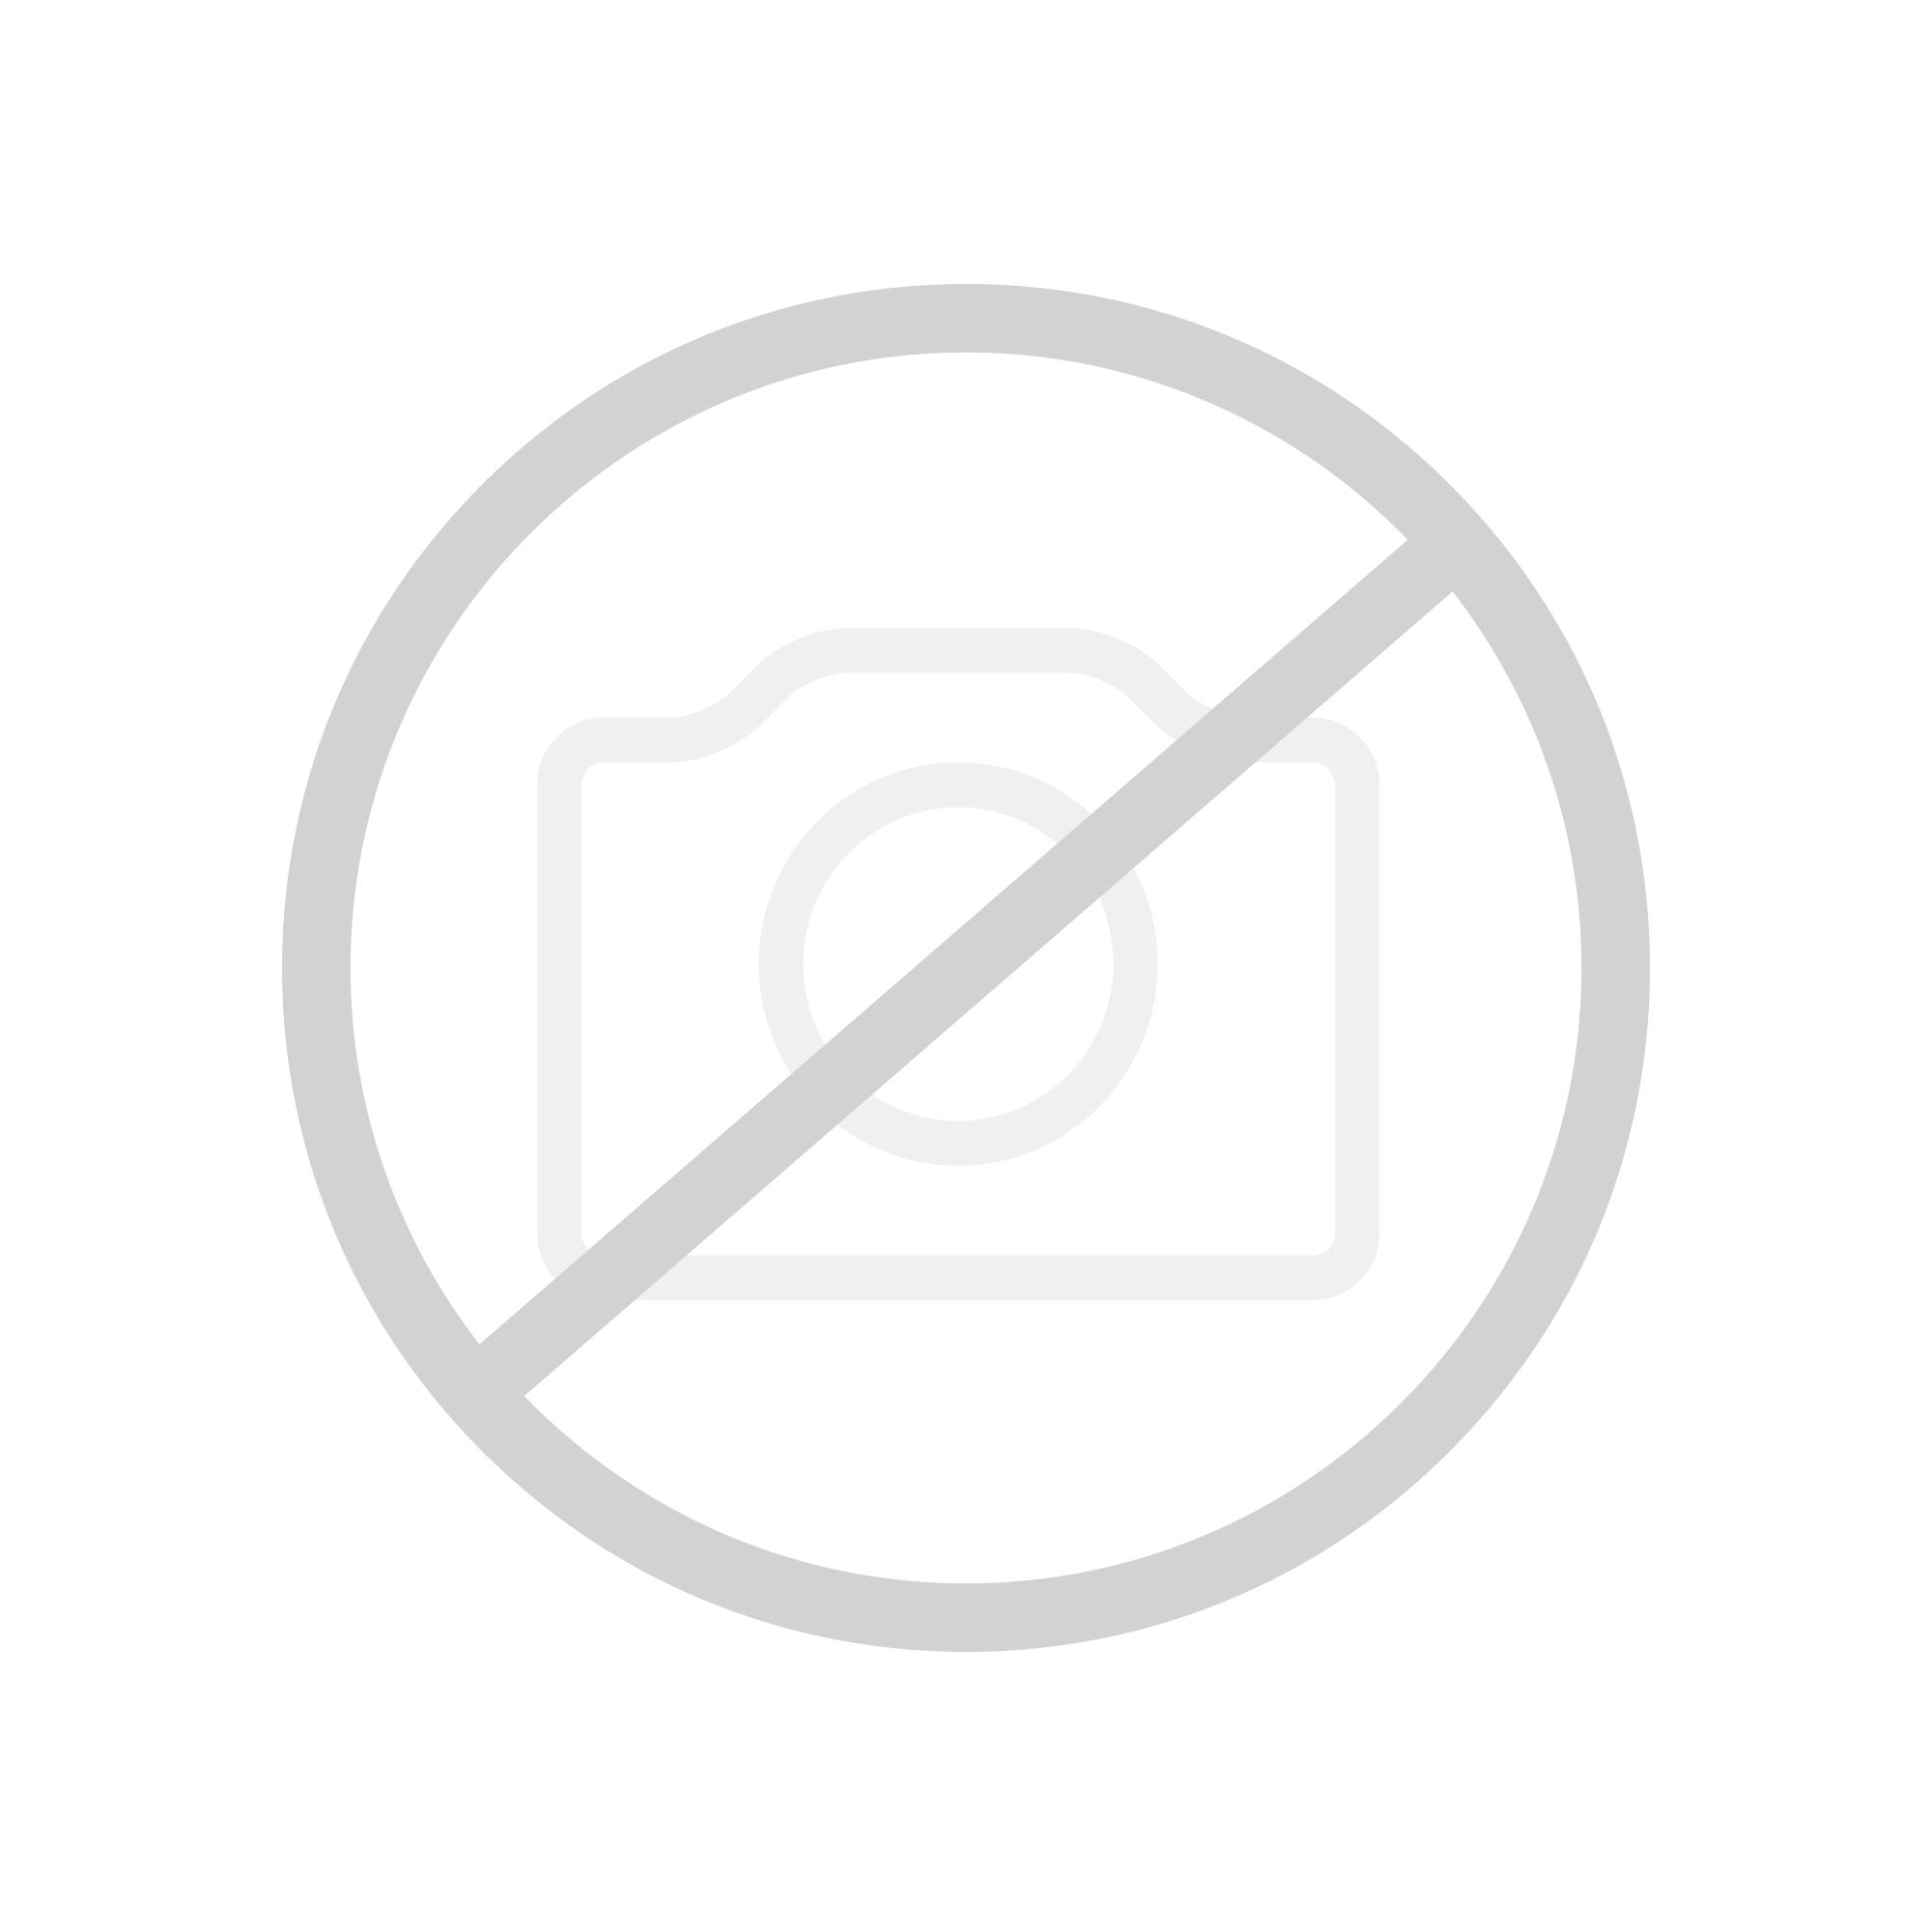 Keuco iLook_move Kosmetikspiegel mit Steckertransformator